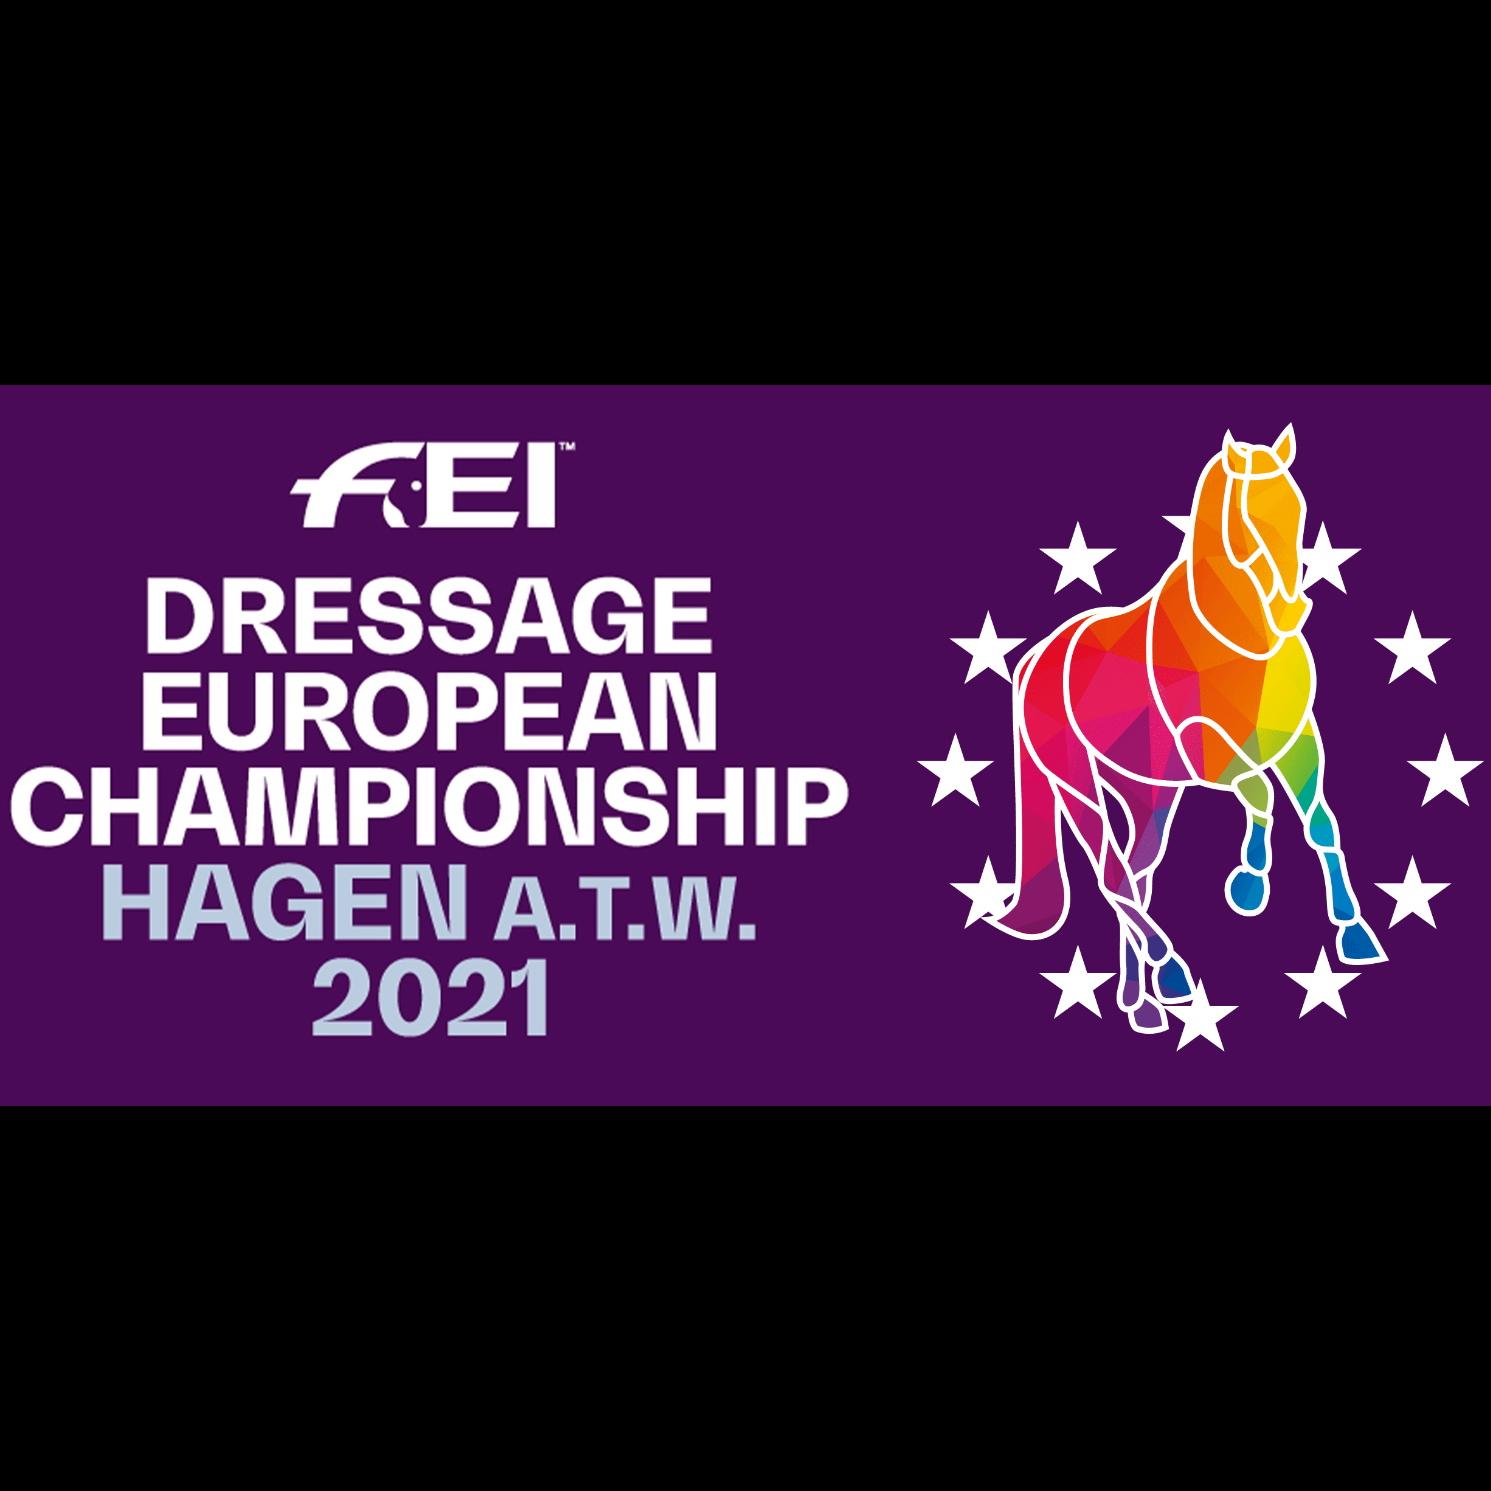 2021 Equestrian European Championships - Dressage